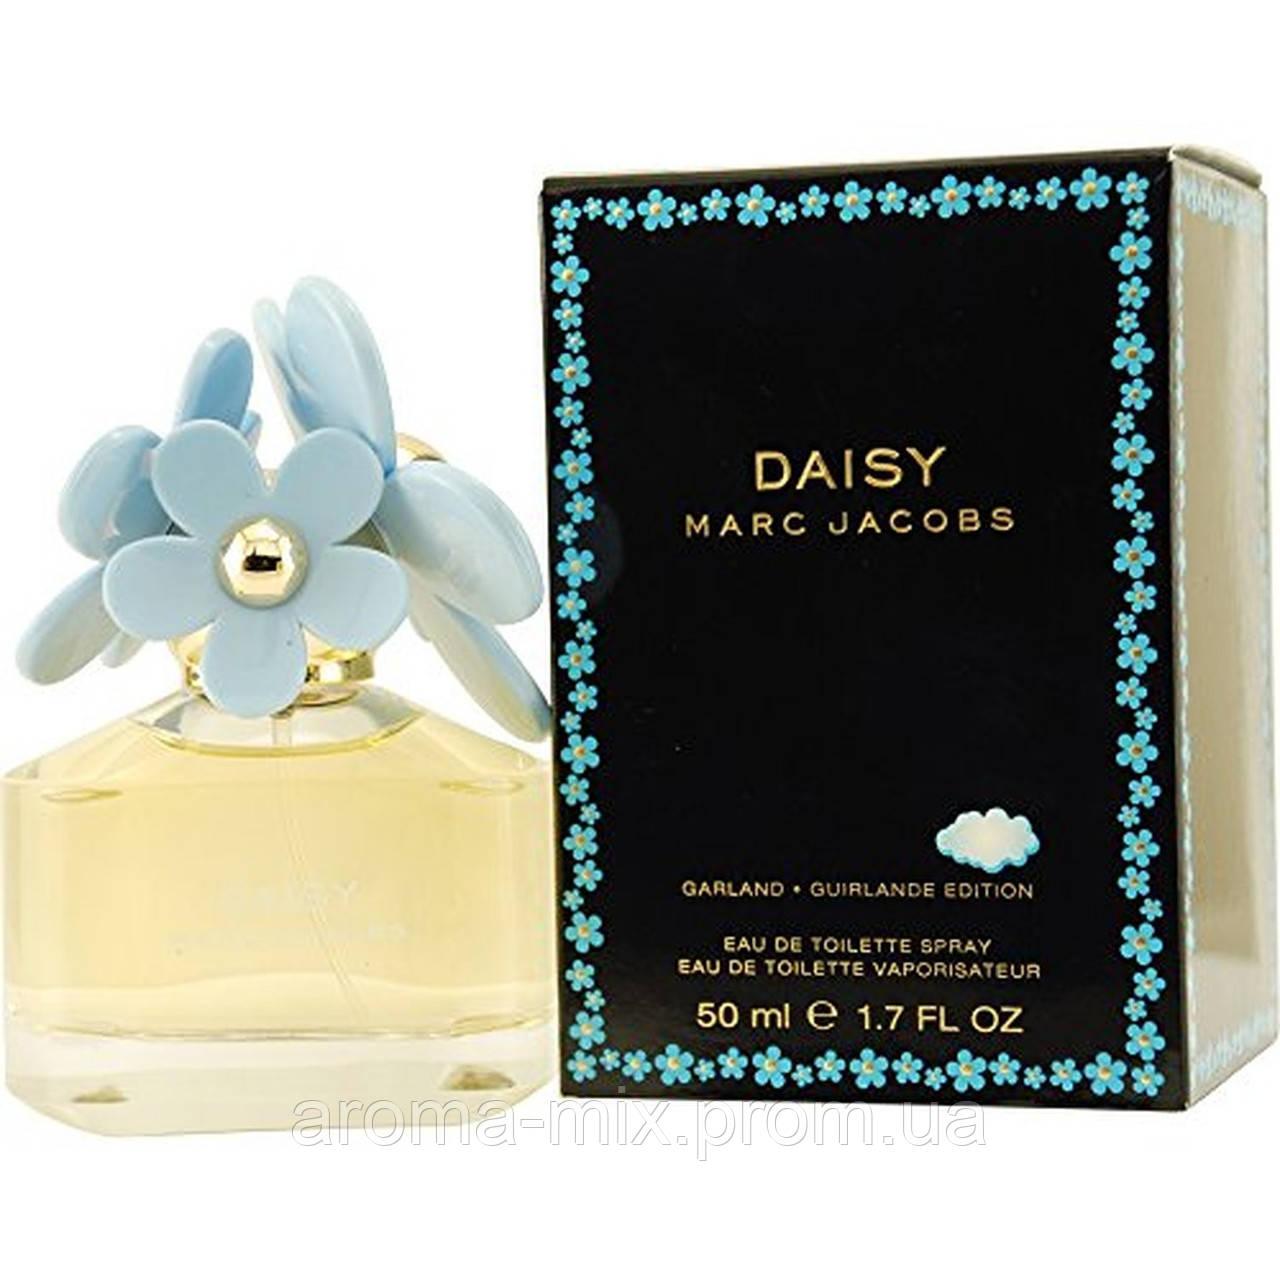 Marc Jacobs Daisy garland guirlande edition - женская туалетная вода